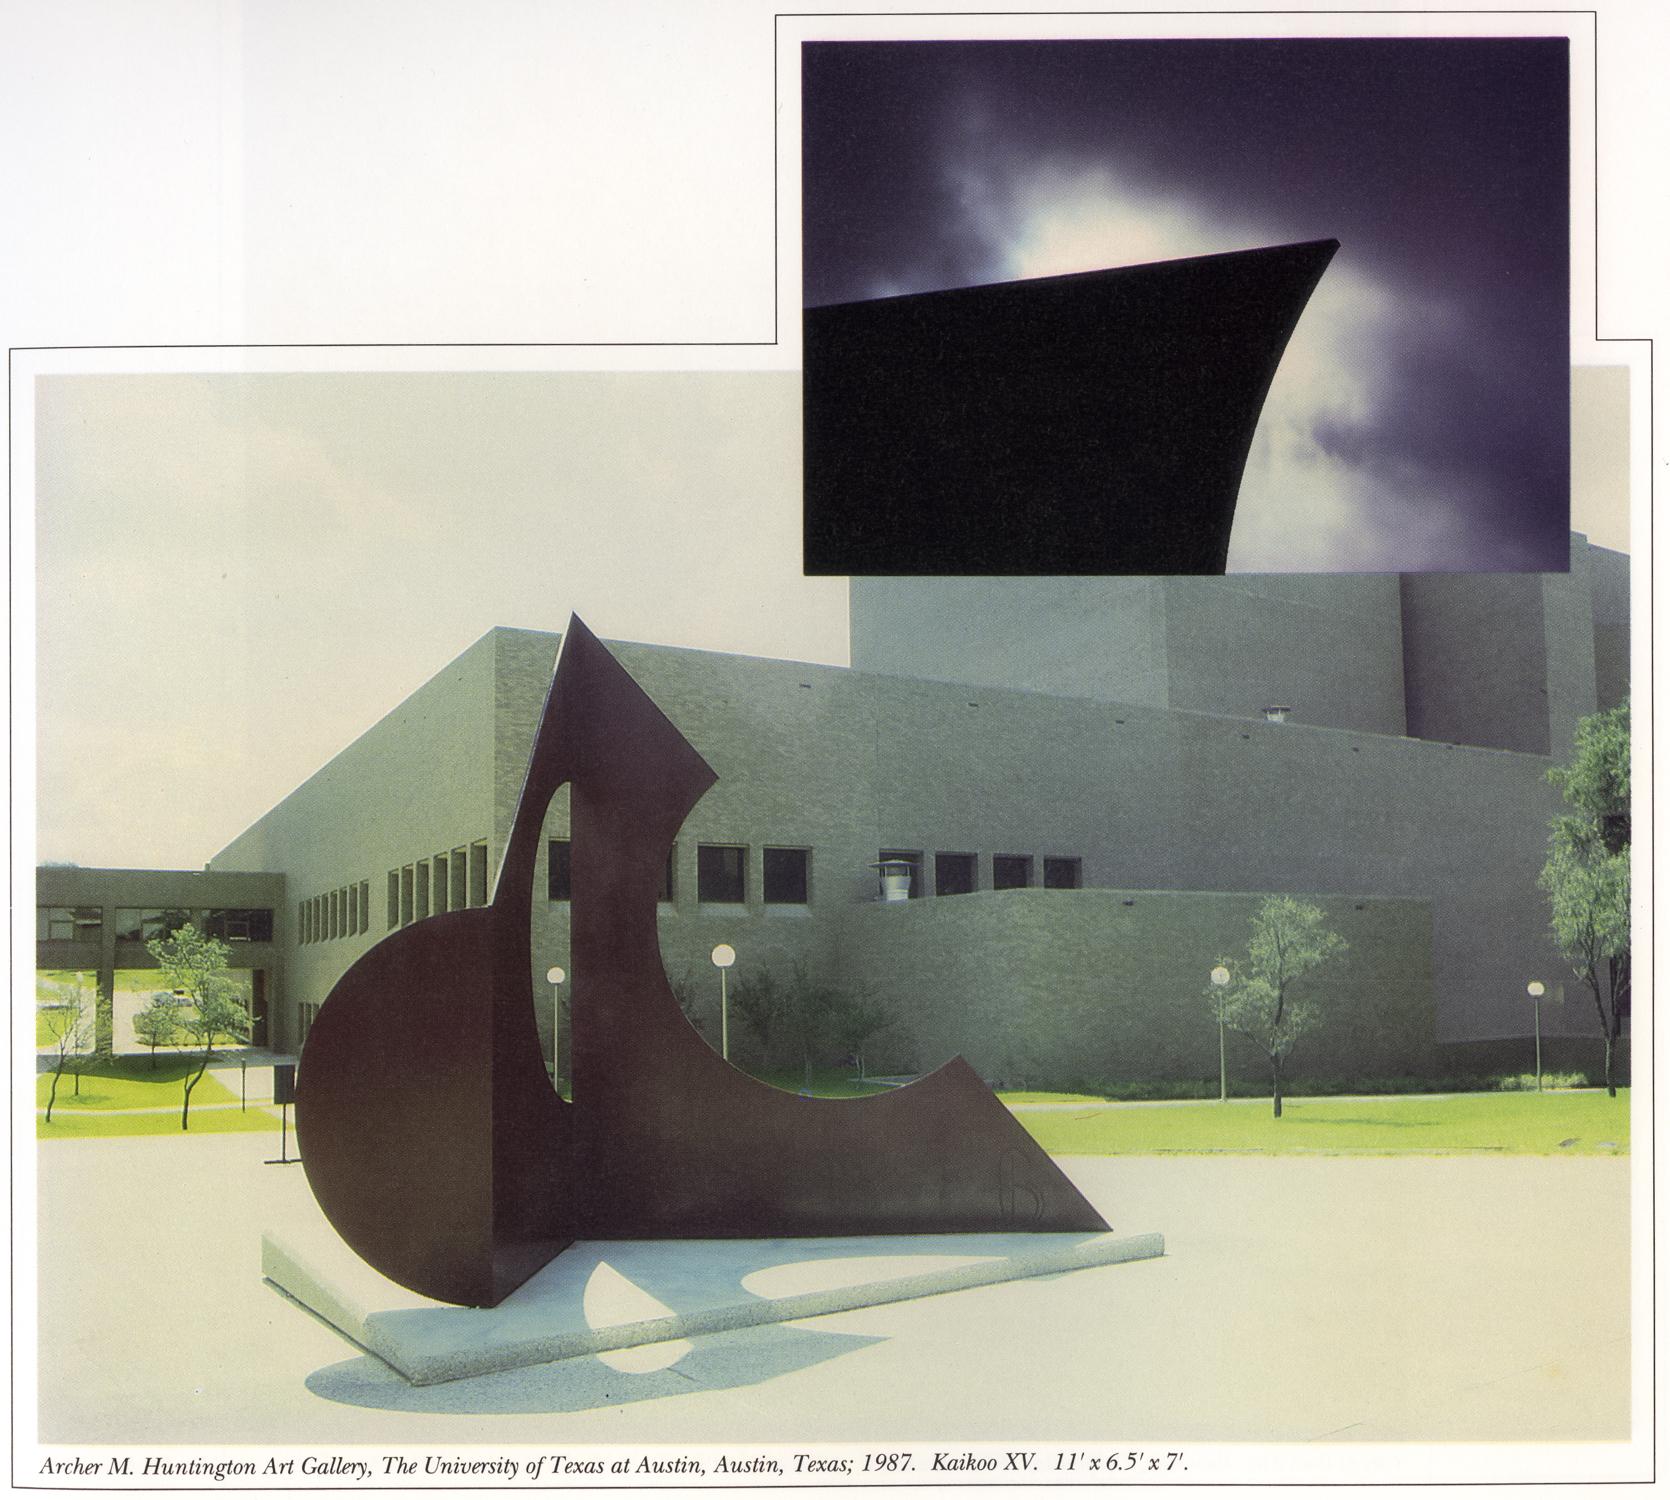 Archer M. Huntington Art Gallery, The University of Texas at Austin, Austin, Texas; 1987.  Kaikoo XV.  11' x 6.5' x 7'.